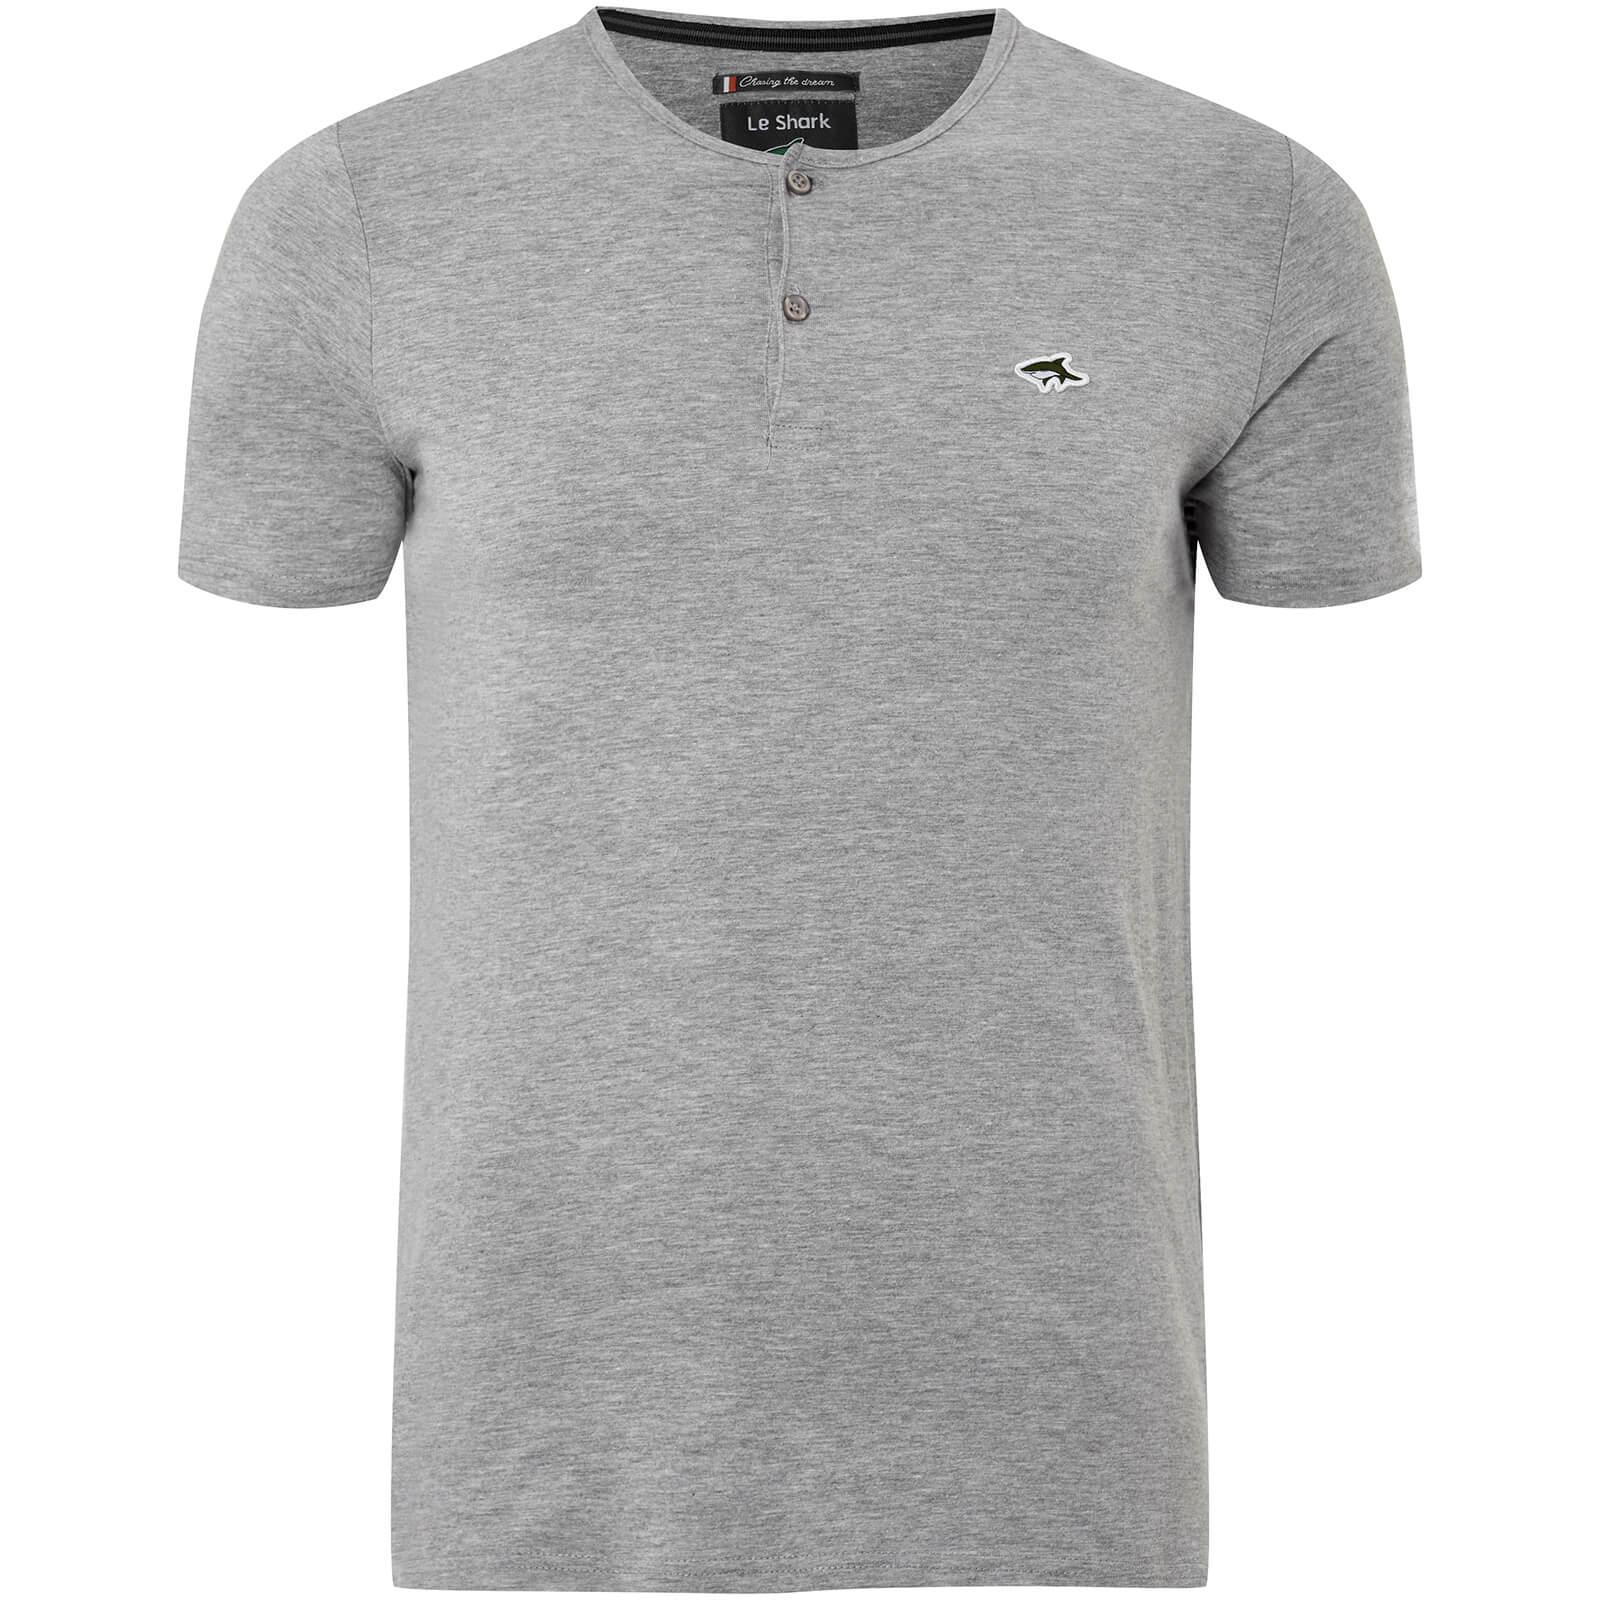 4667064d90fe Le Shark Men's Cook Button Neck T-Shirt - Light Grey Marl Clothing   Zavvi